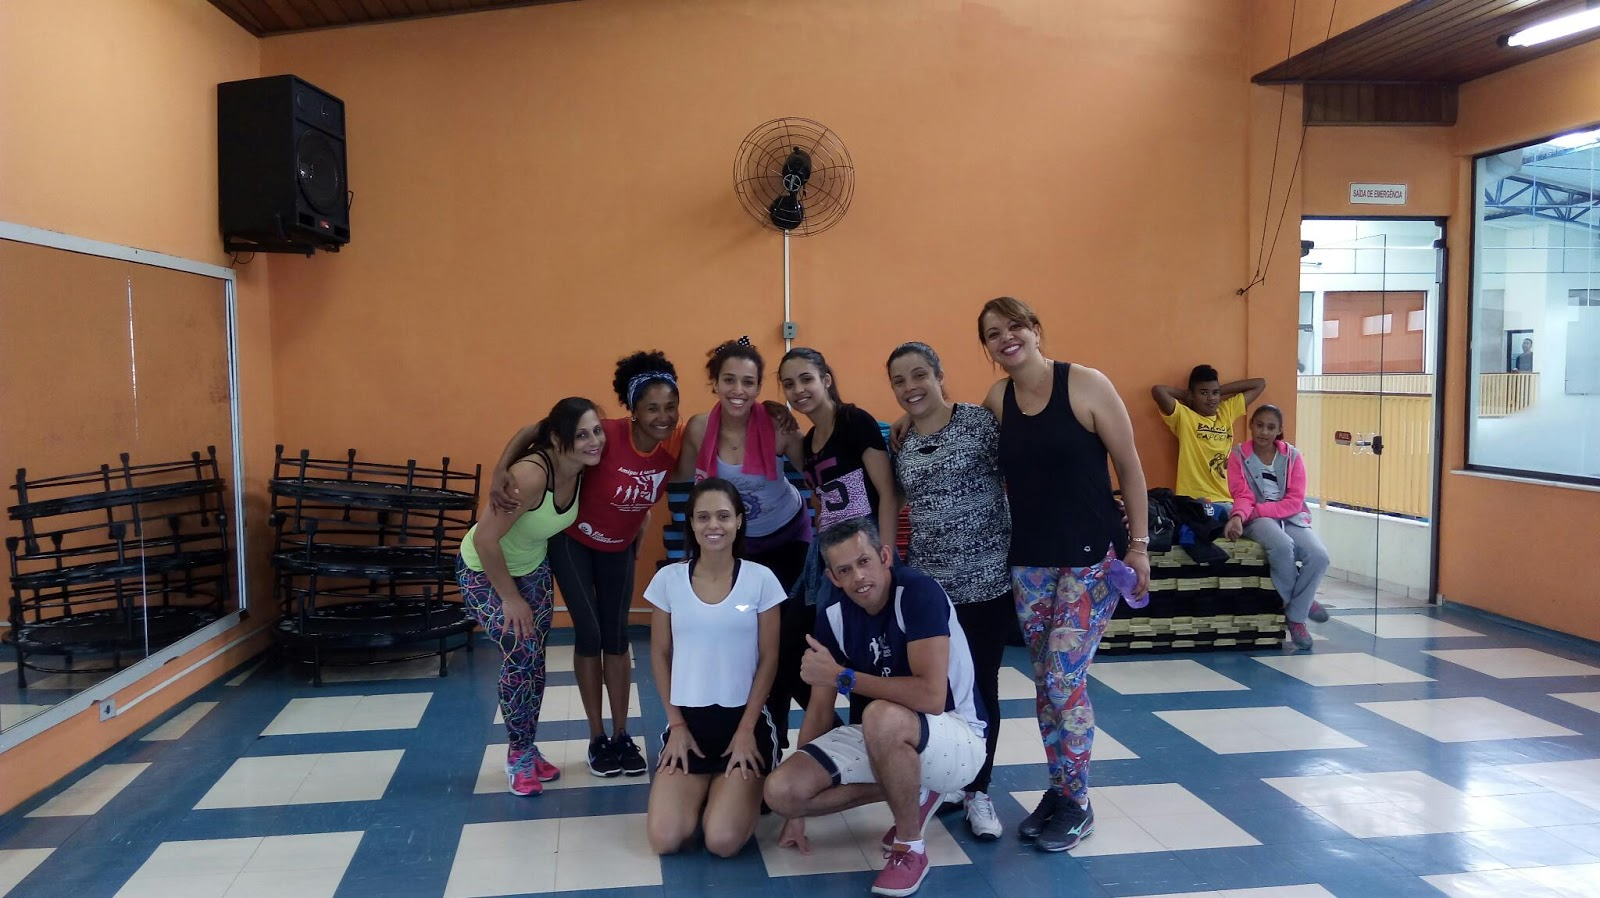 Circuito Na Academia : Personal trainner marcio beserra circuito com os